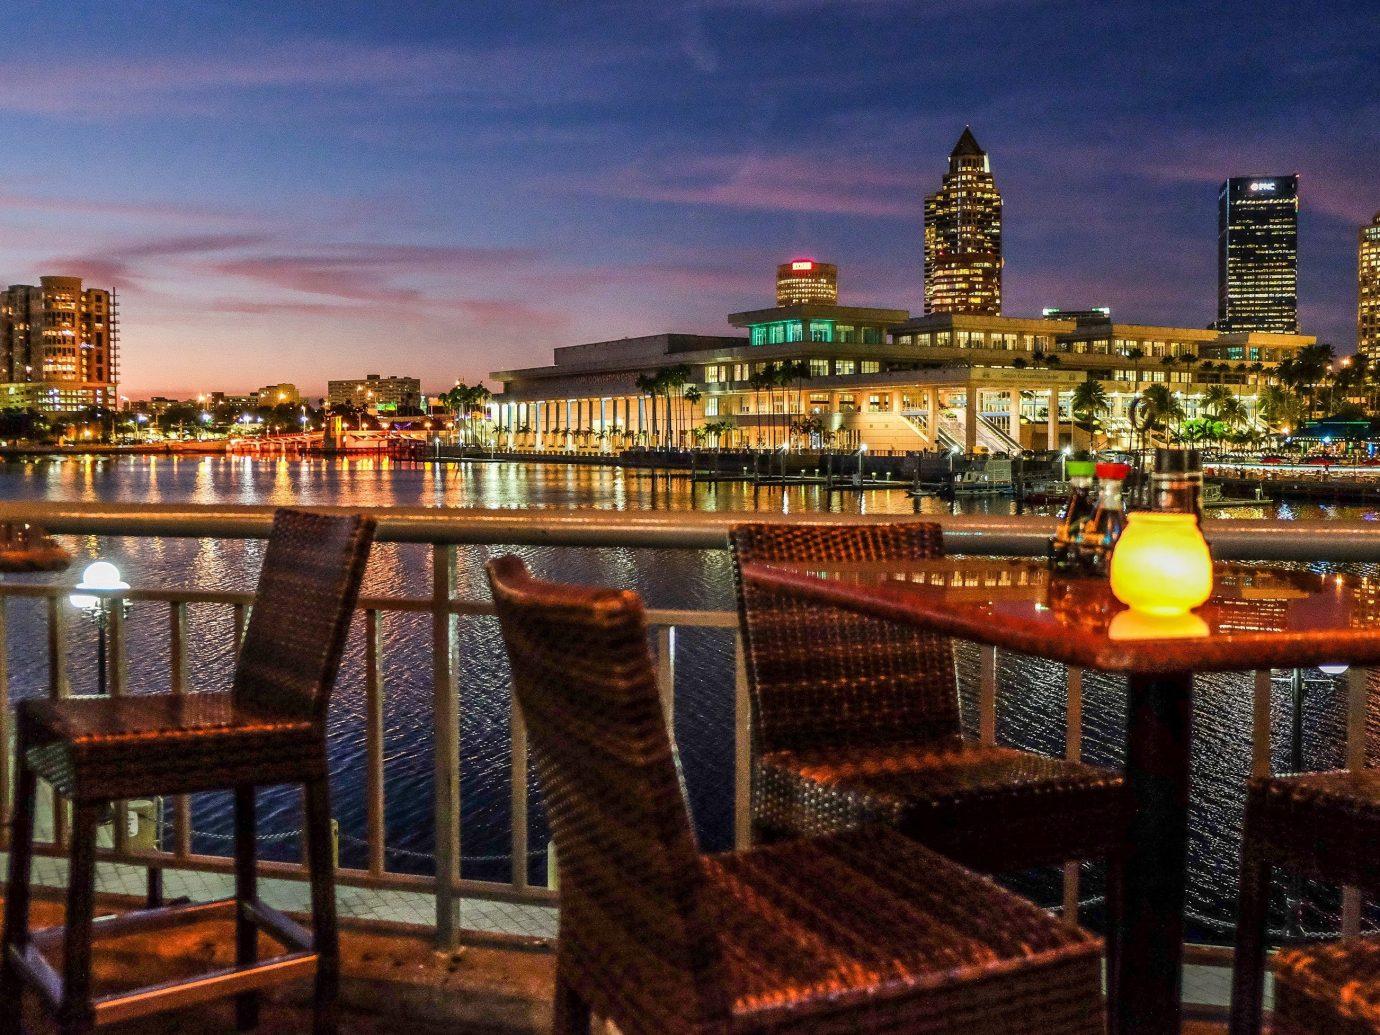 sky outdoor landmark City cityscape night human settlement evening tourism skyline palace plaza dusk